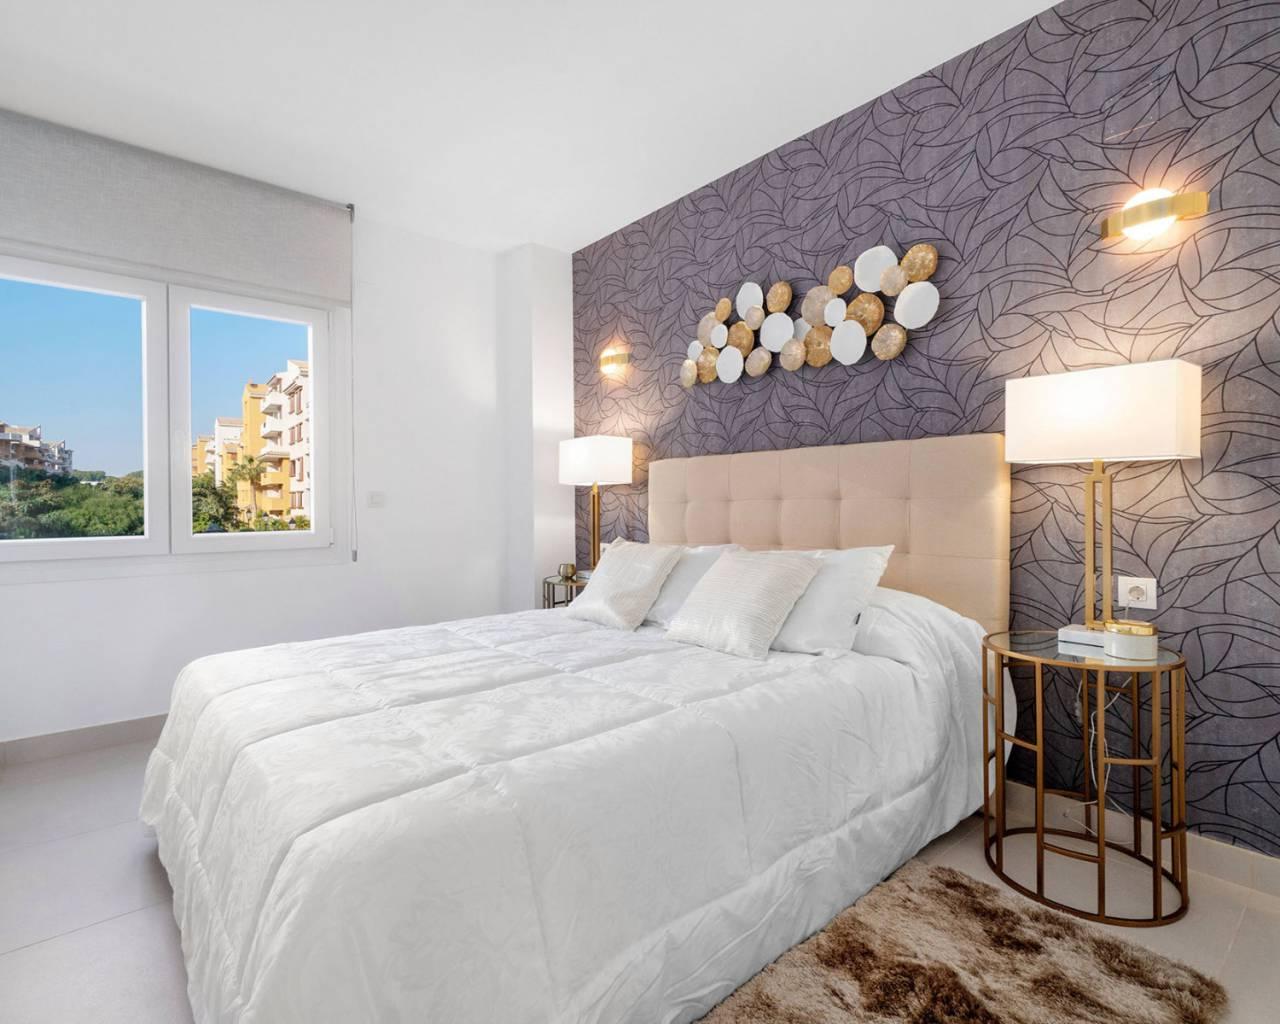 nieuwbouw-appartement-torrevieja-punta-prima_2899_xl